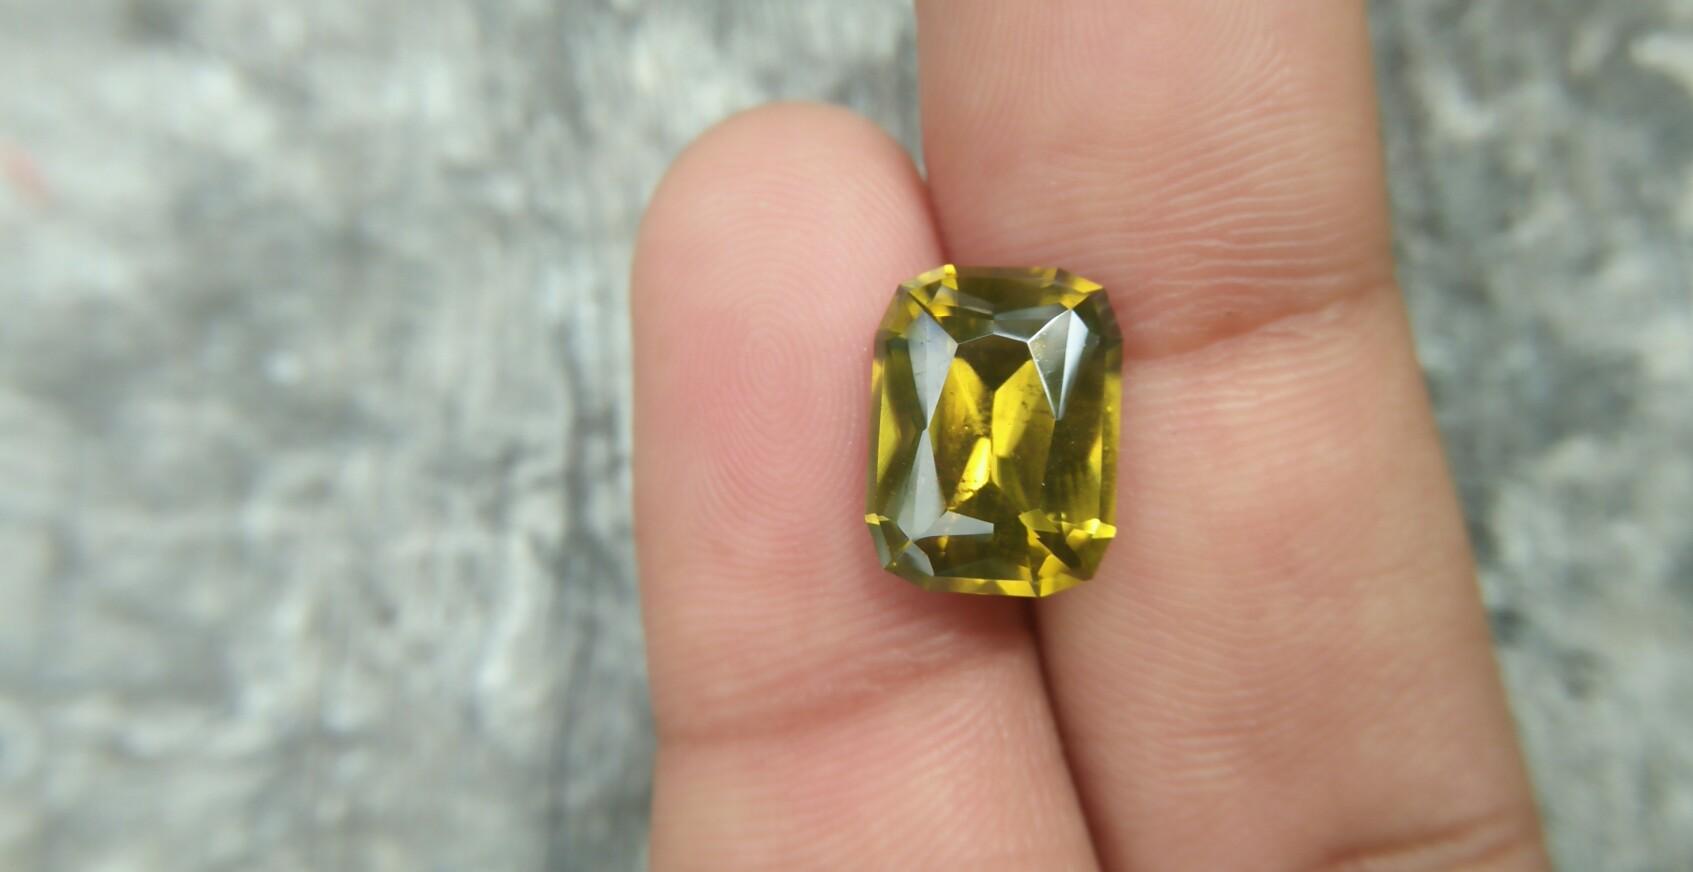 Ceylon Natural Melichrysos Weight : 6.85Cts Dimension : 12.1mm x 9.1mm x 5.9mm Colour : Greenish Yellow Treatment : Unheated/ Natural Clarity : Clean Mineral : Ratnapura Sri Lanka